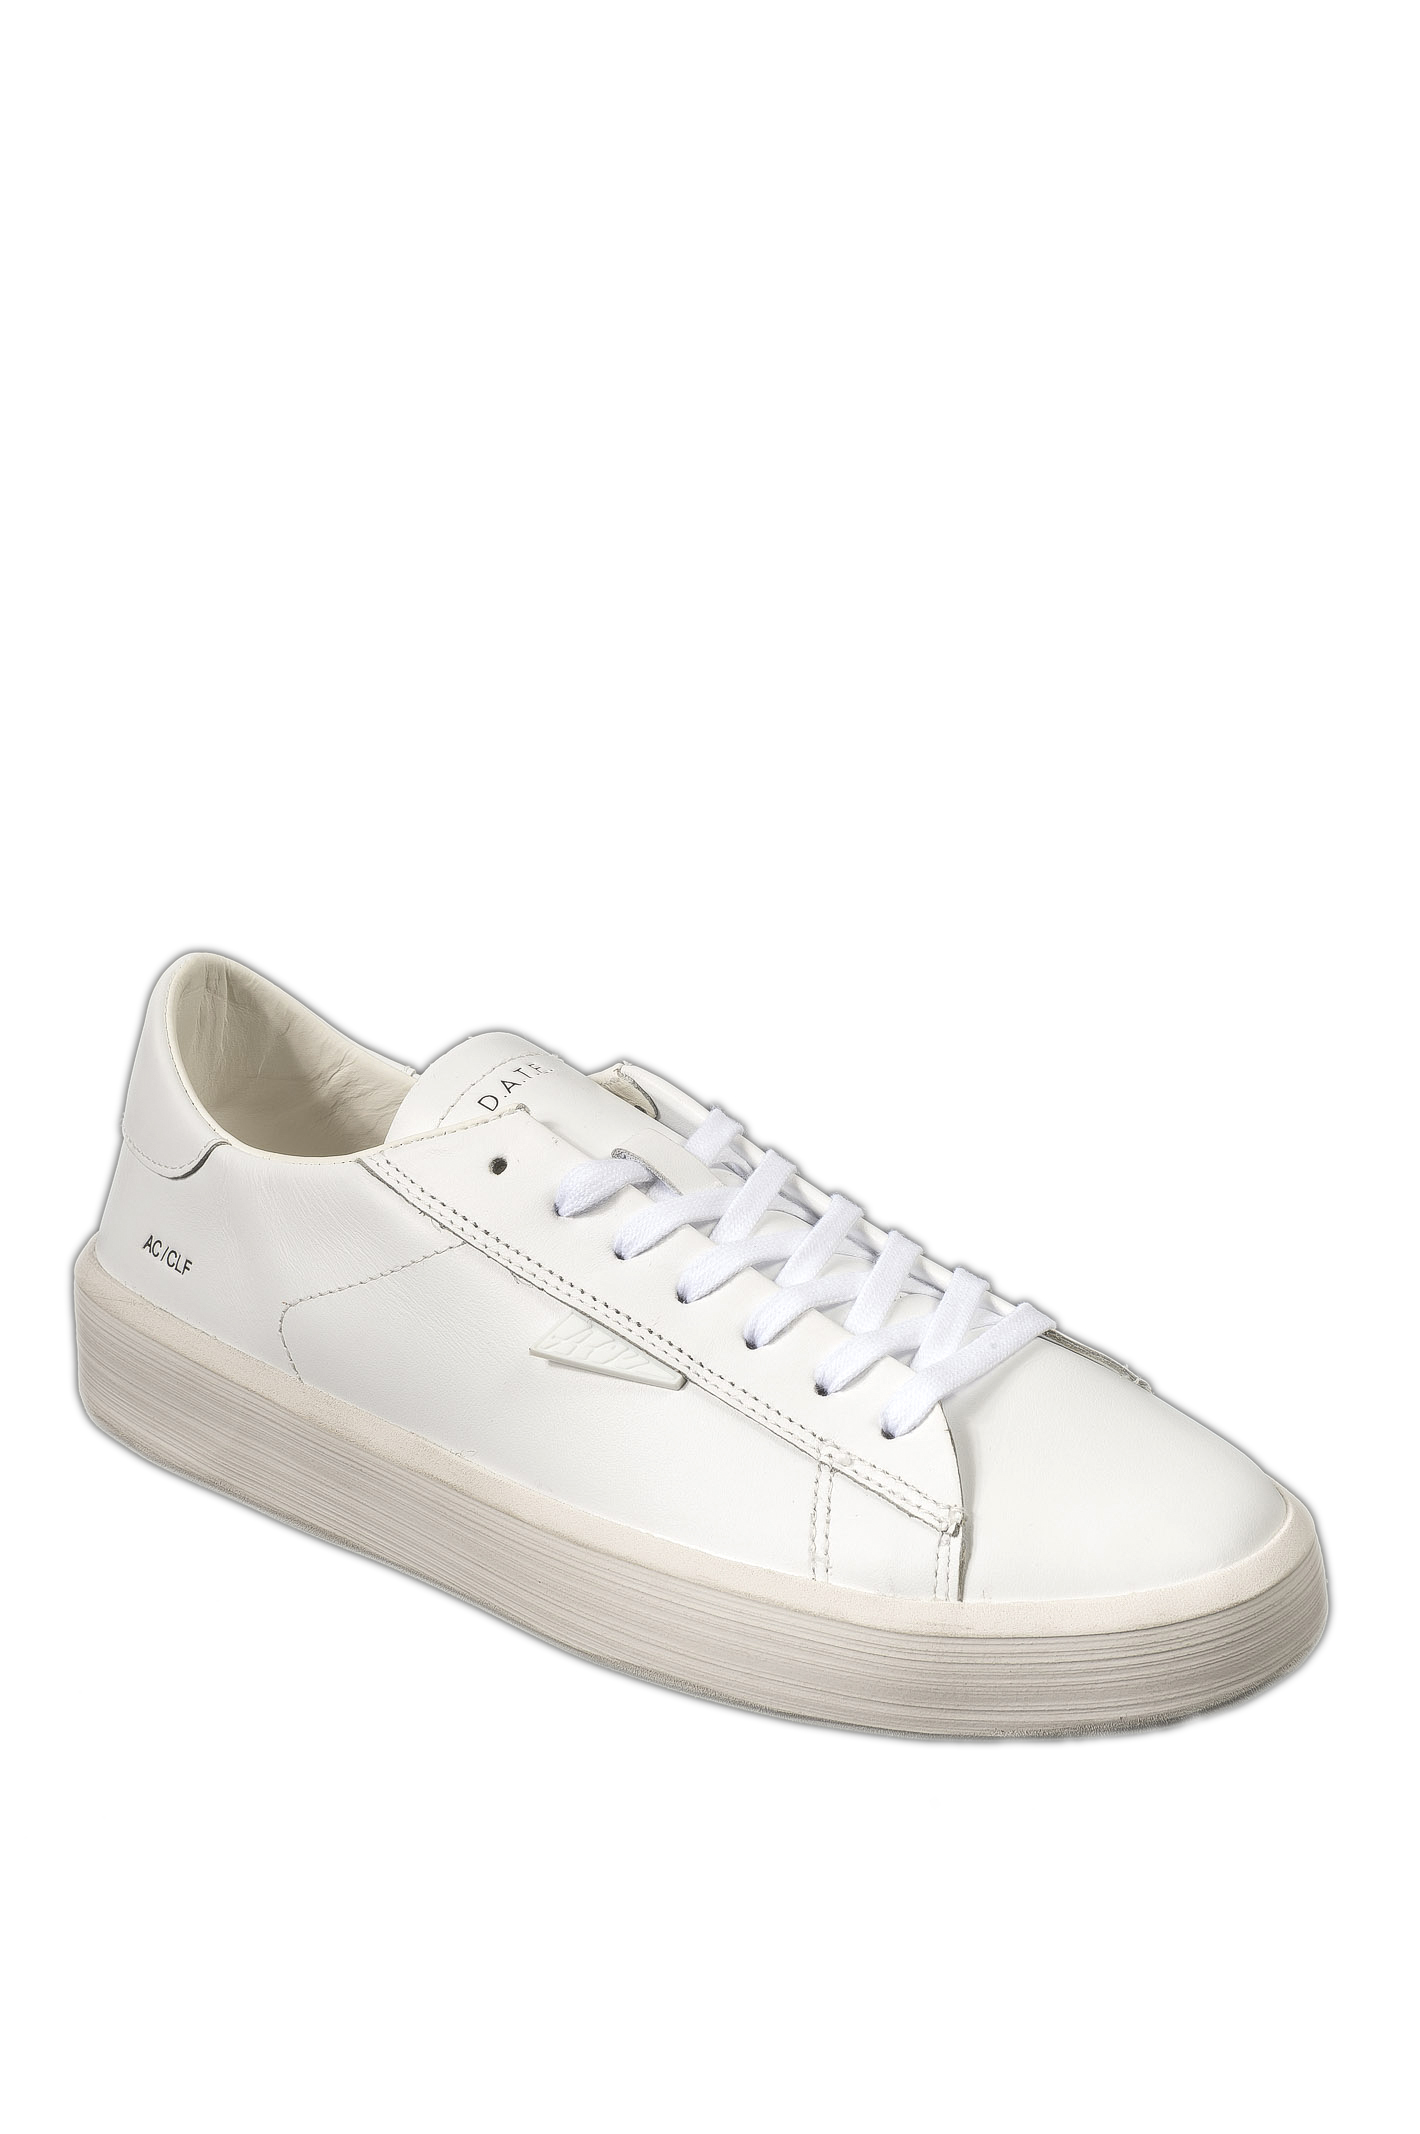 ACECALF-WHITE